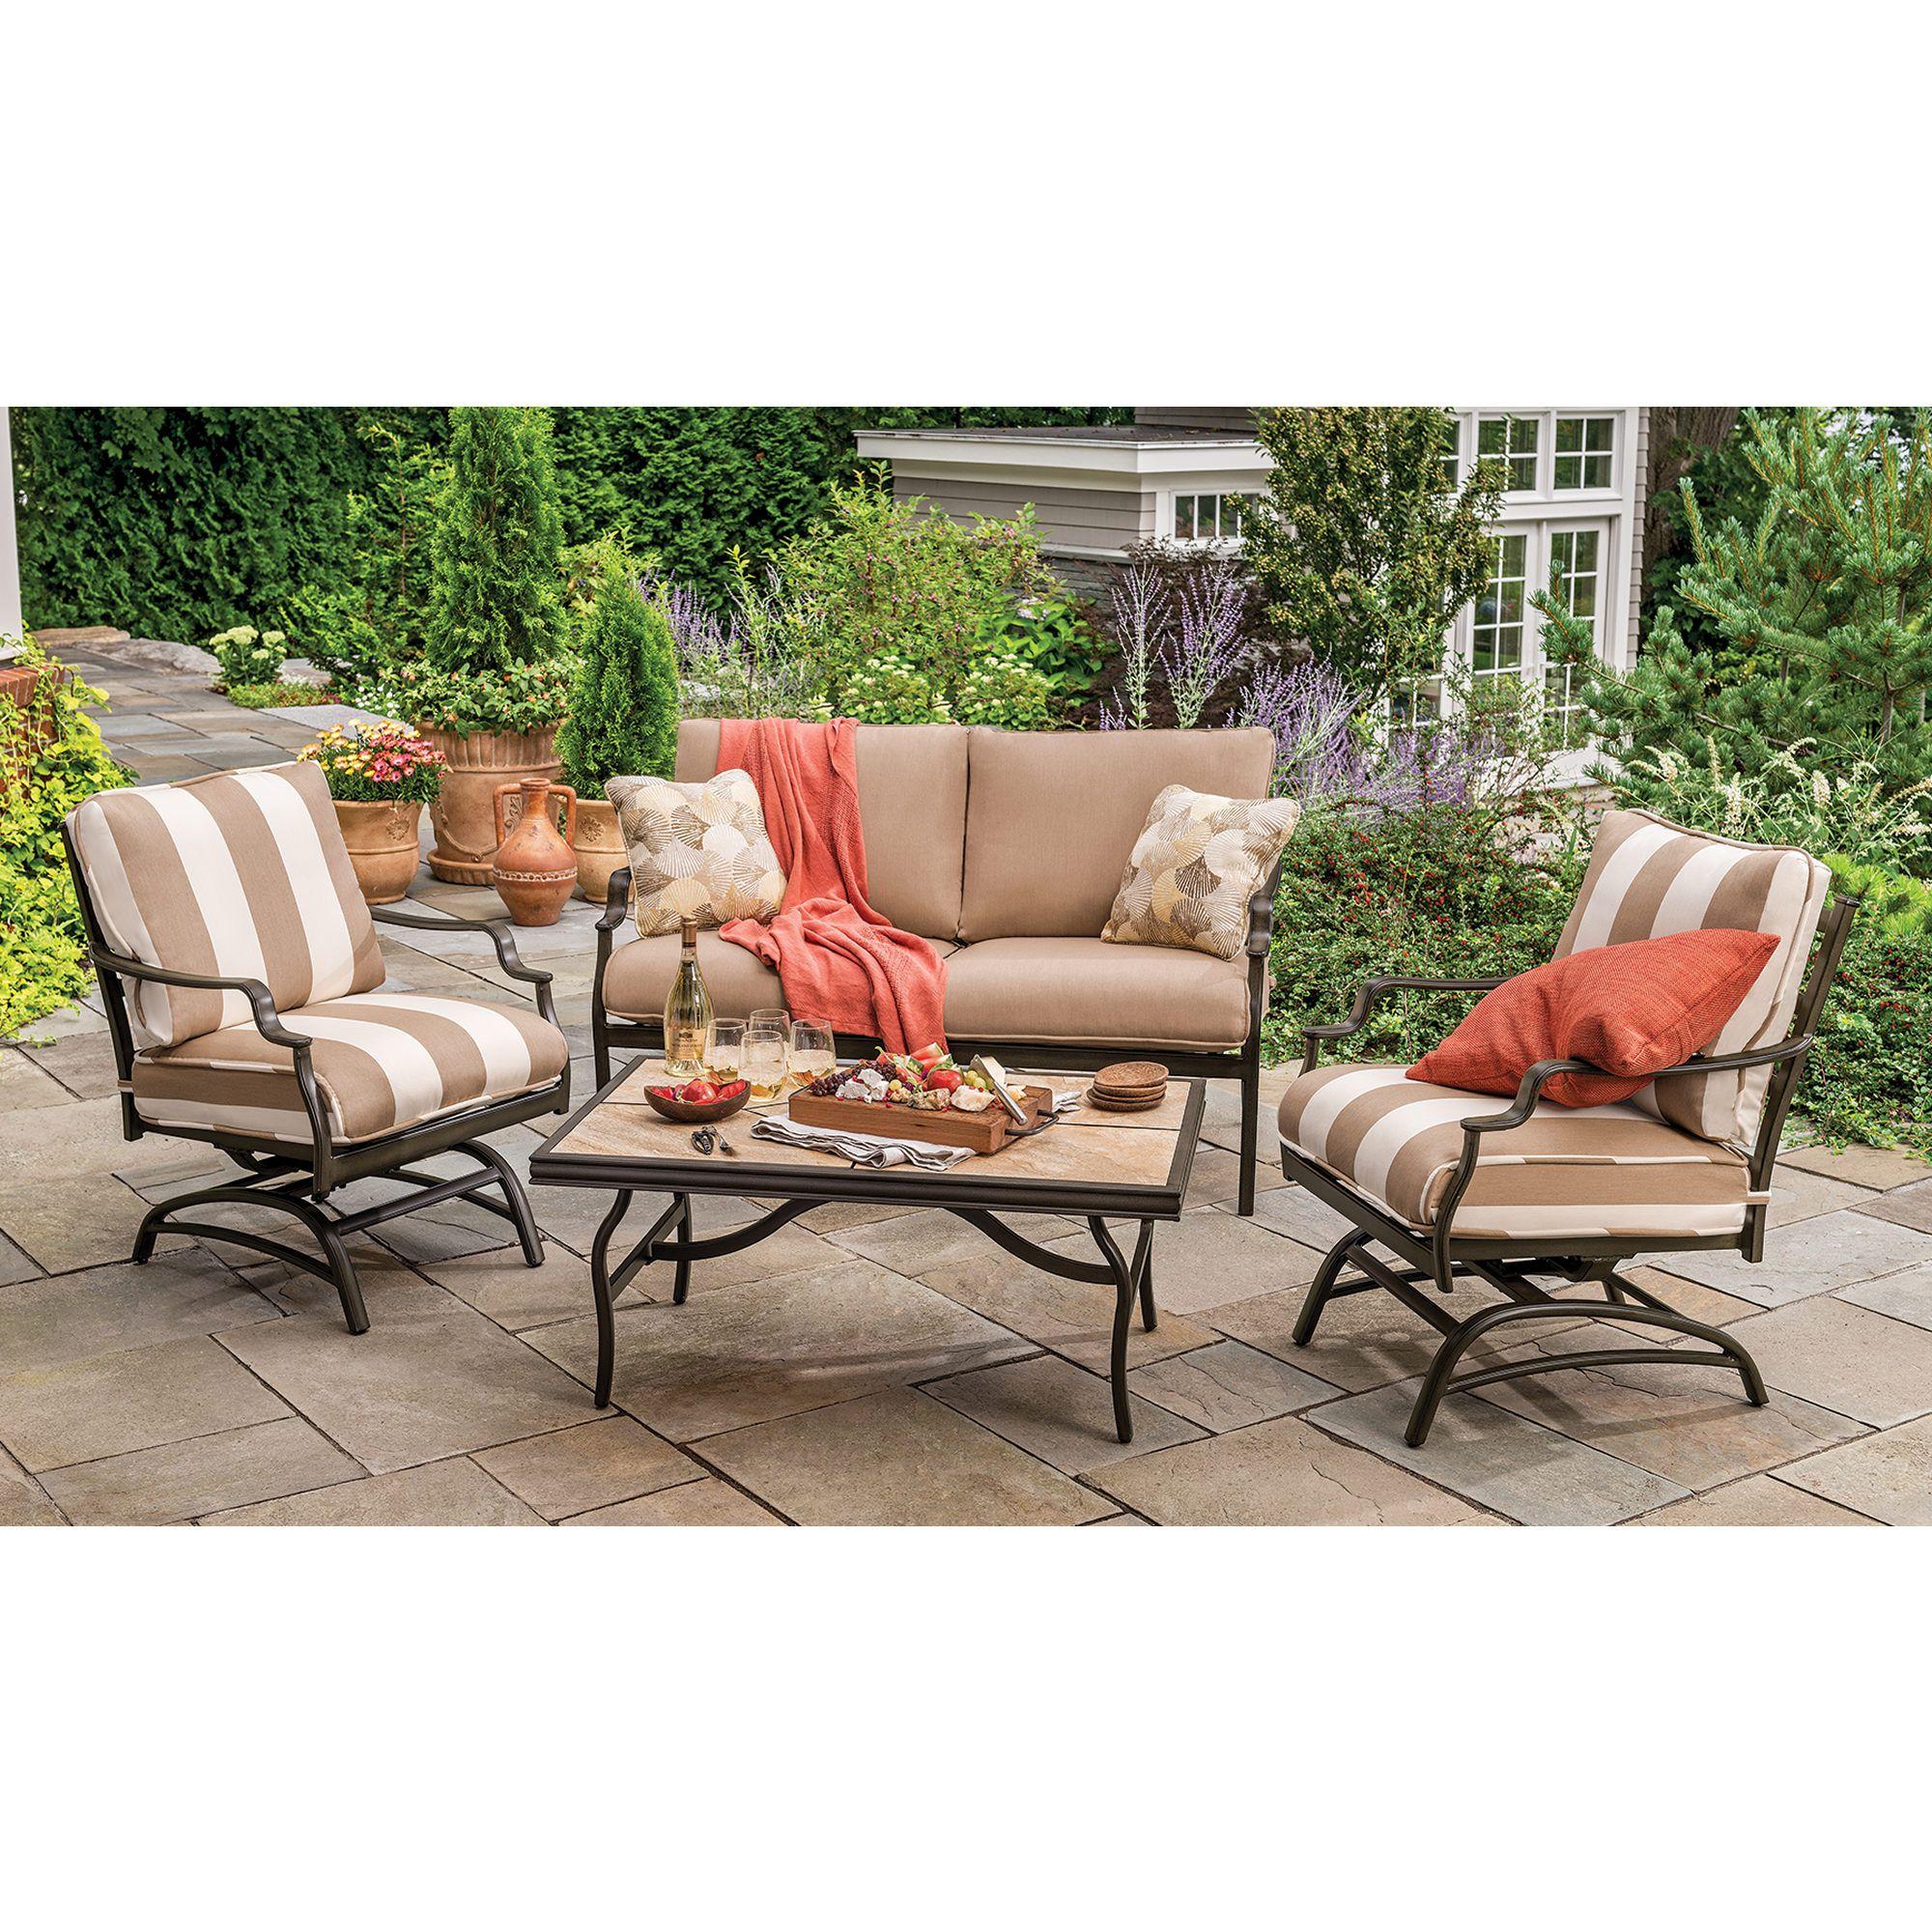 Berkley Jensen Trevi 4 Piece Deep Seating Patio Set Outdoor Furniture Sets Patio Patio Furniture Sets